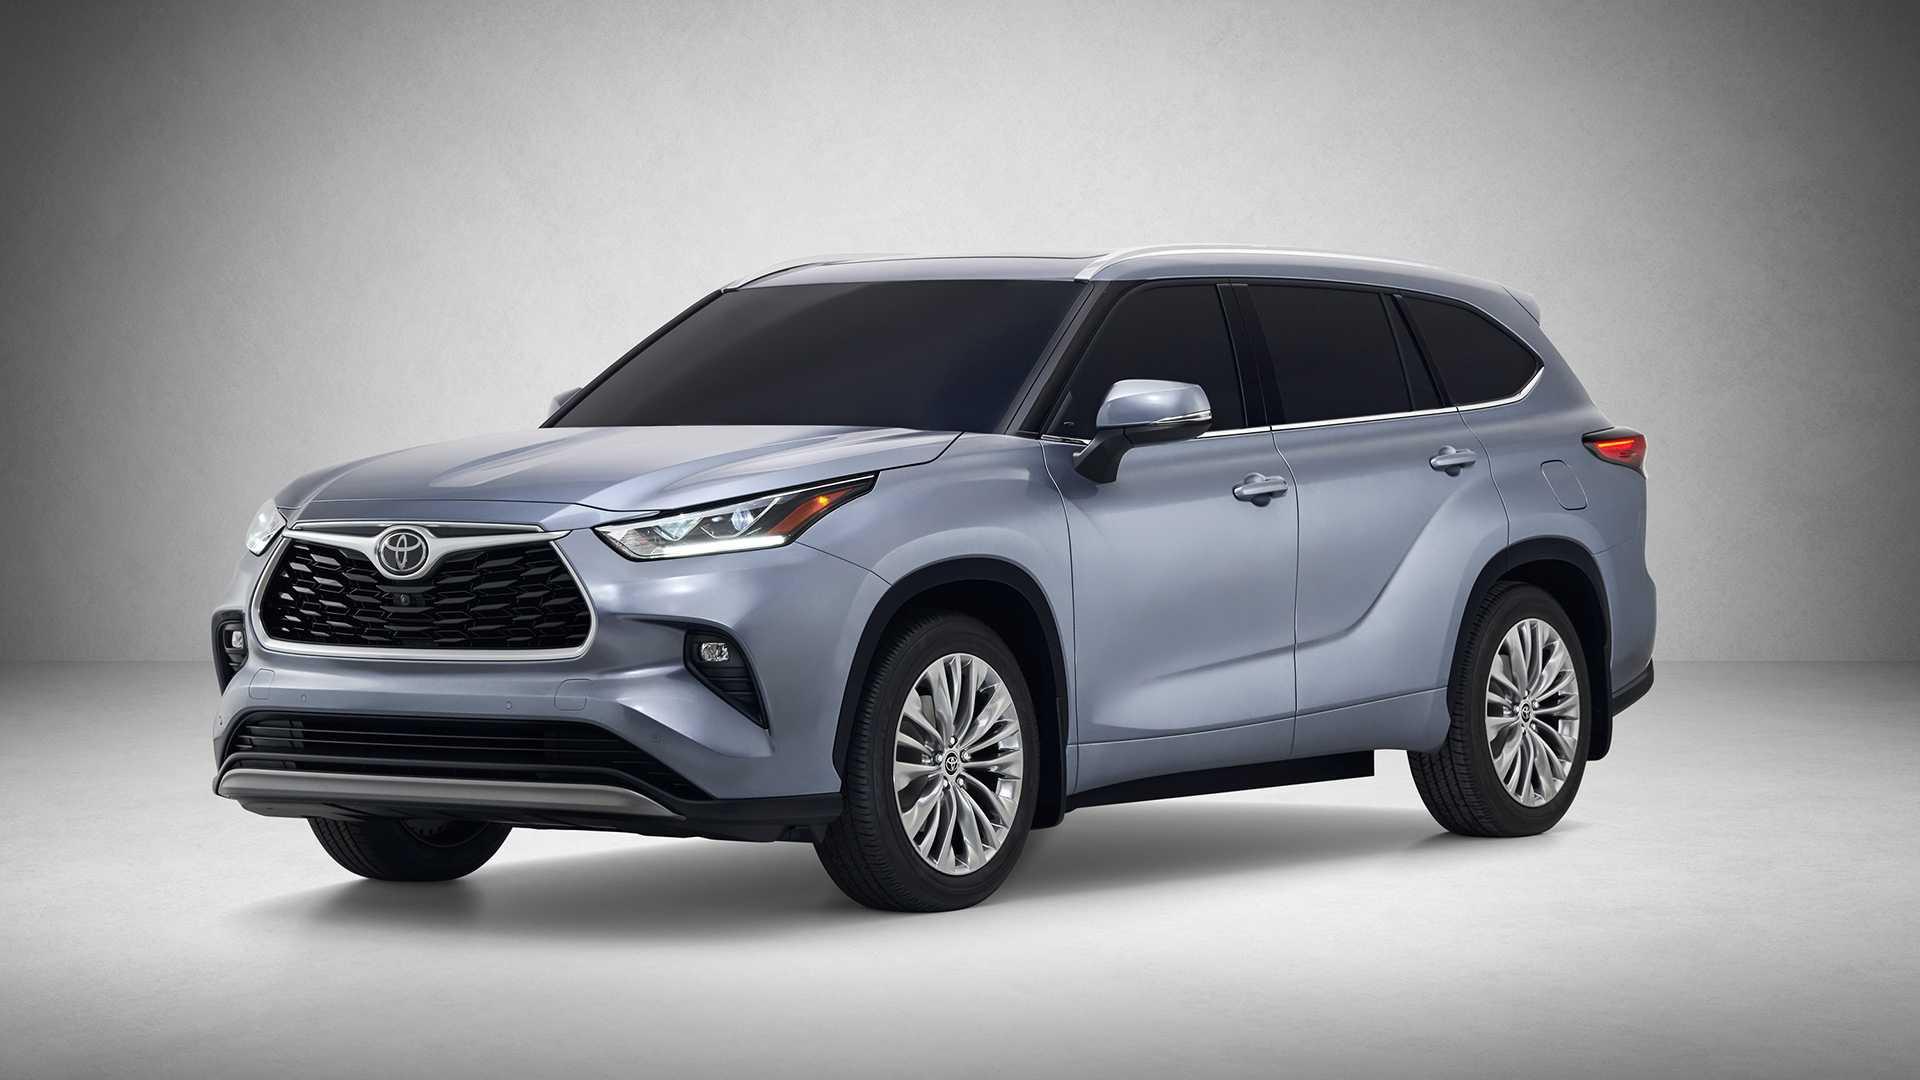 Тойота Хайлендер 2019-2020 в новом кузове фото цена и характеристики обновленной модели от Toyota